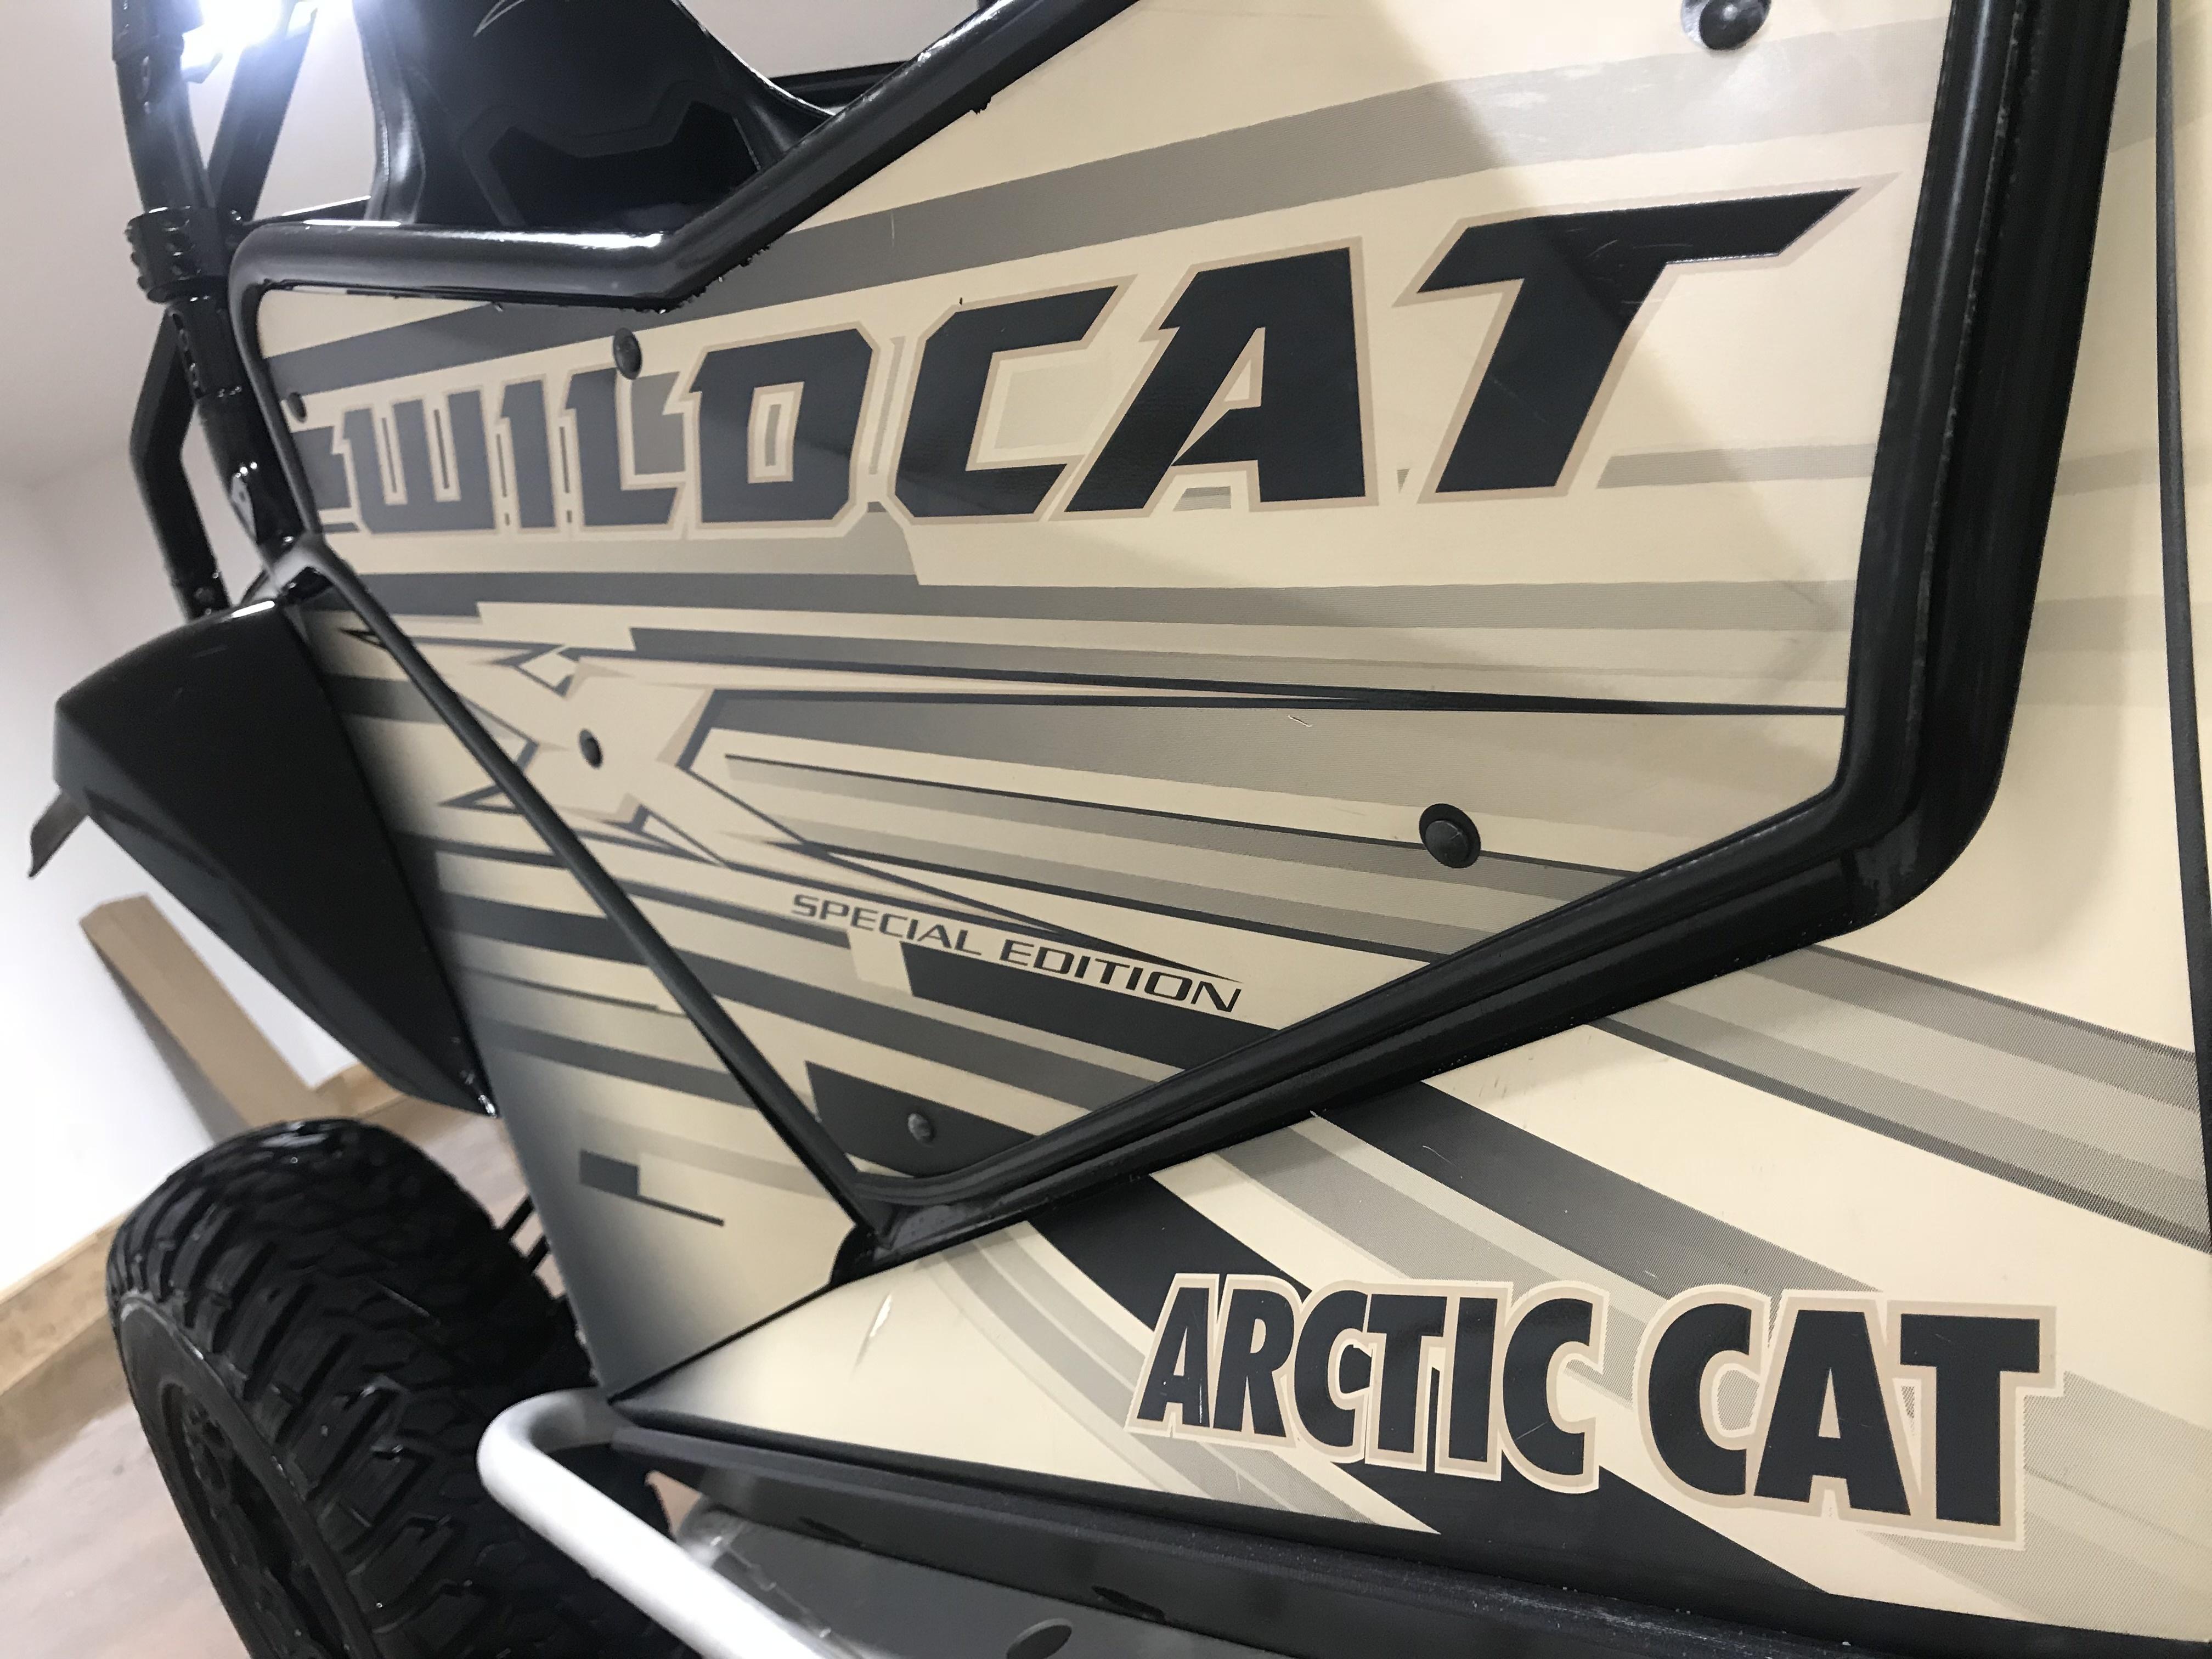 2016 Arctic Cat Wildcat X Special Edition #120 of 300